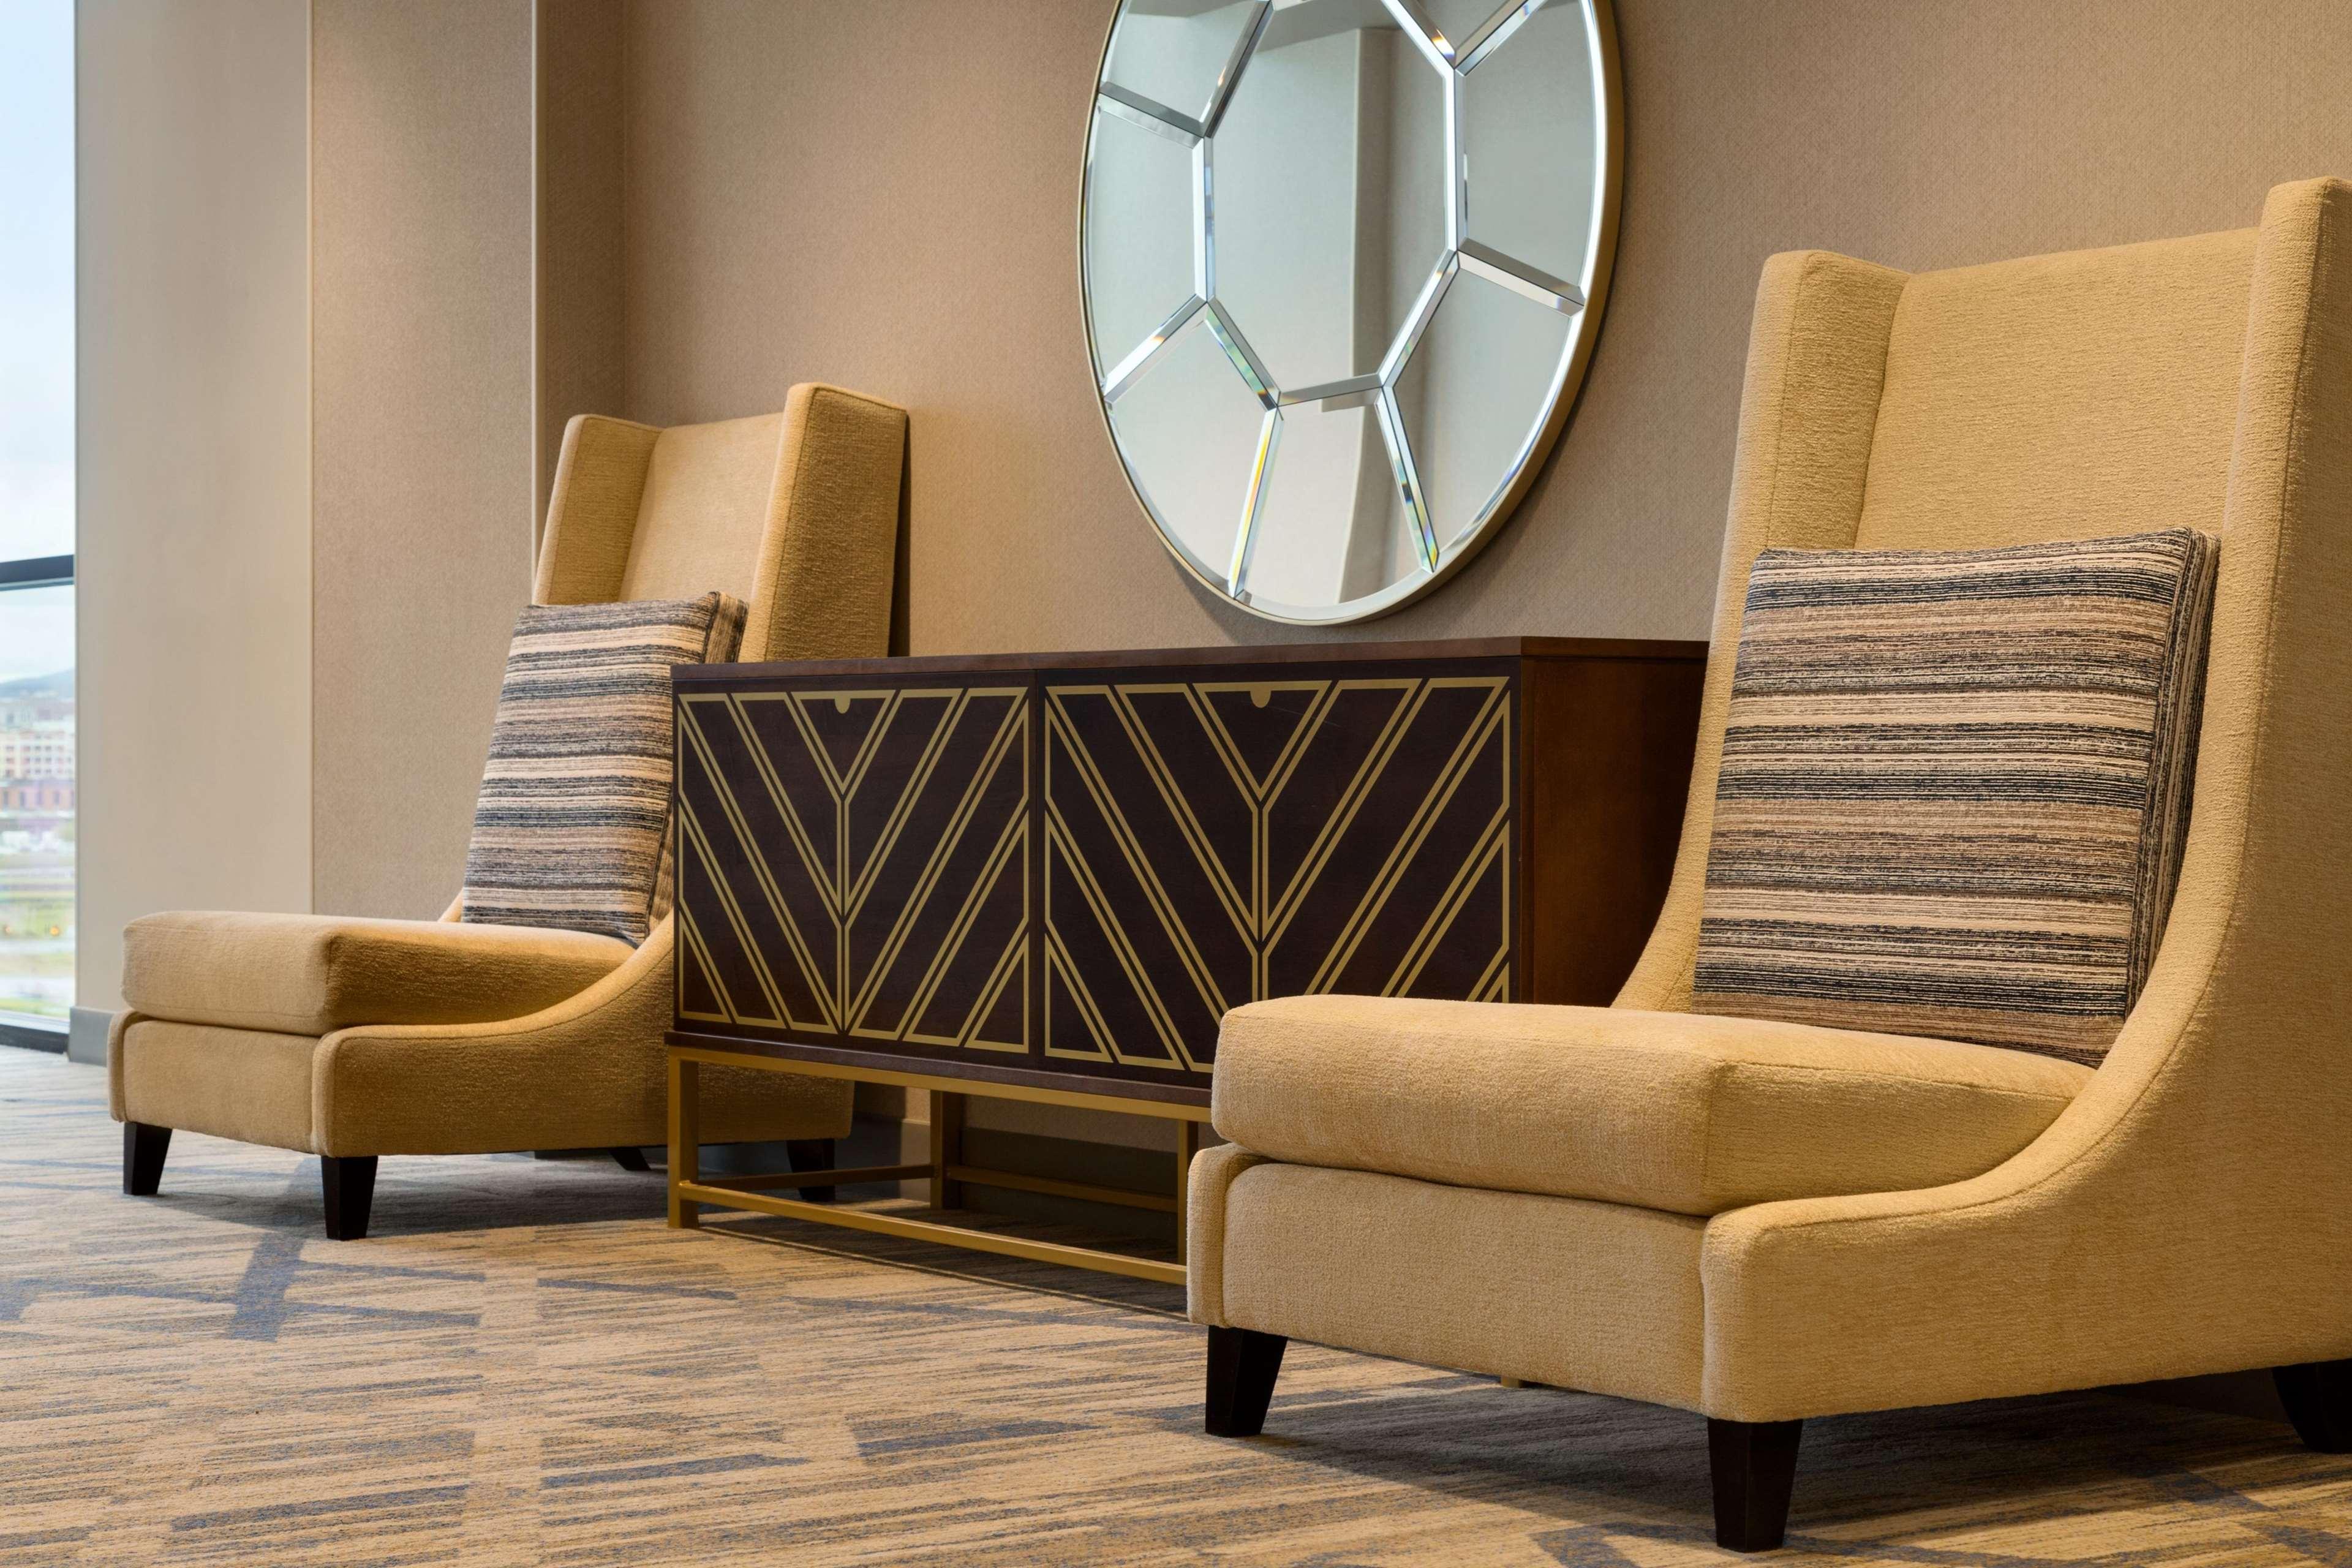 Embassy Suites by Hilton Syracuse Destiny USA image 20